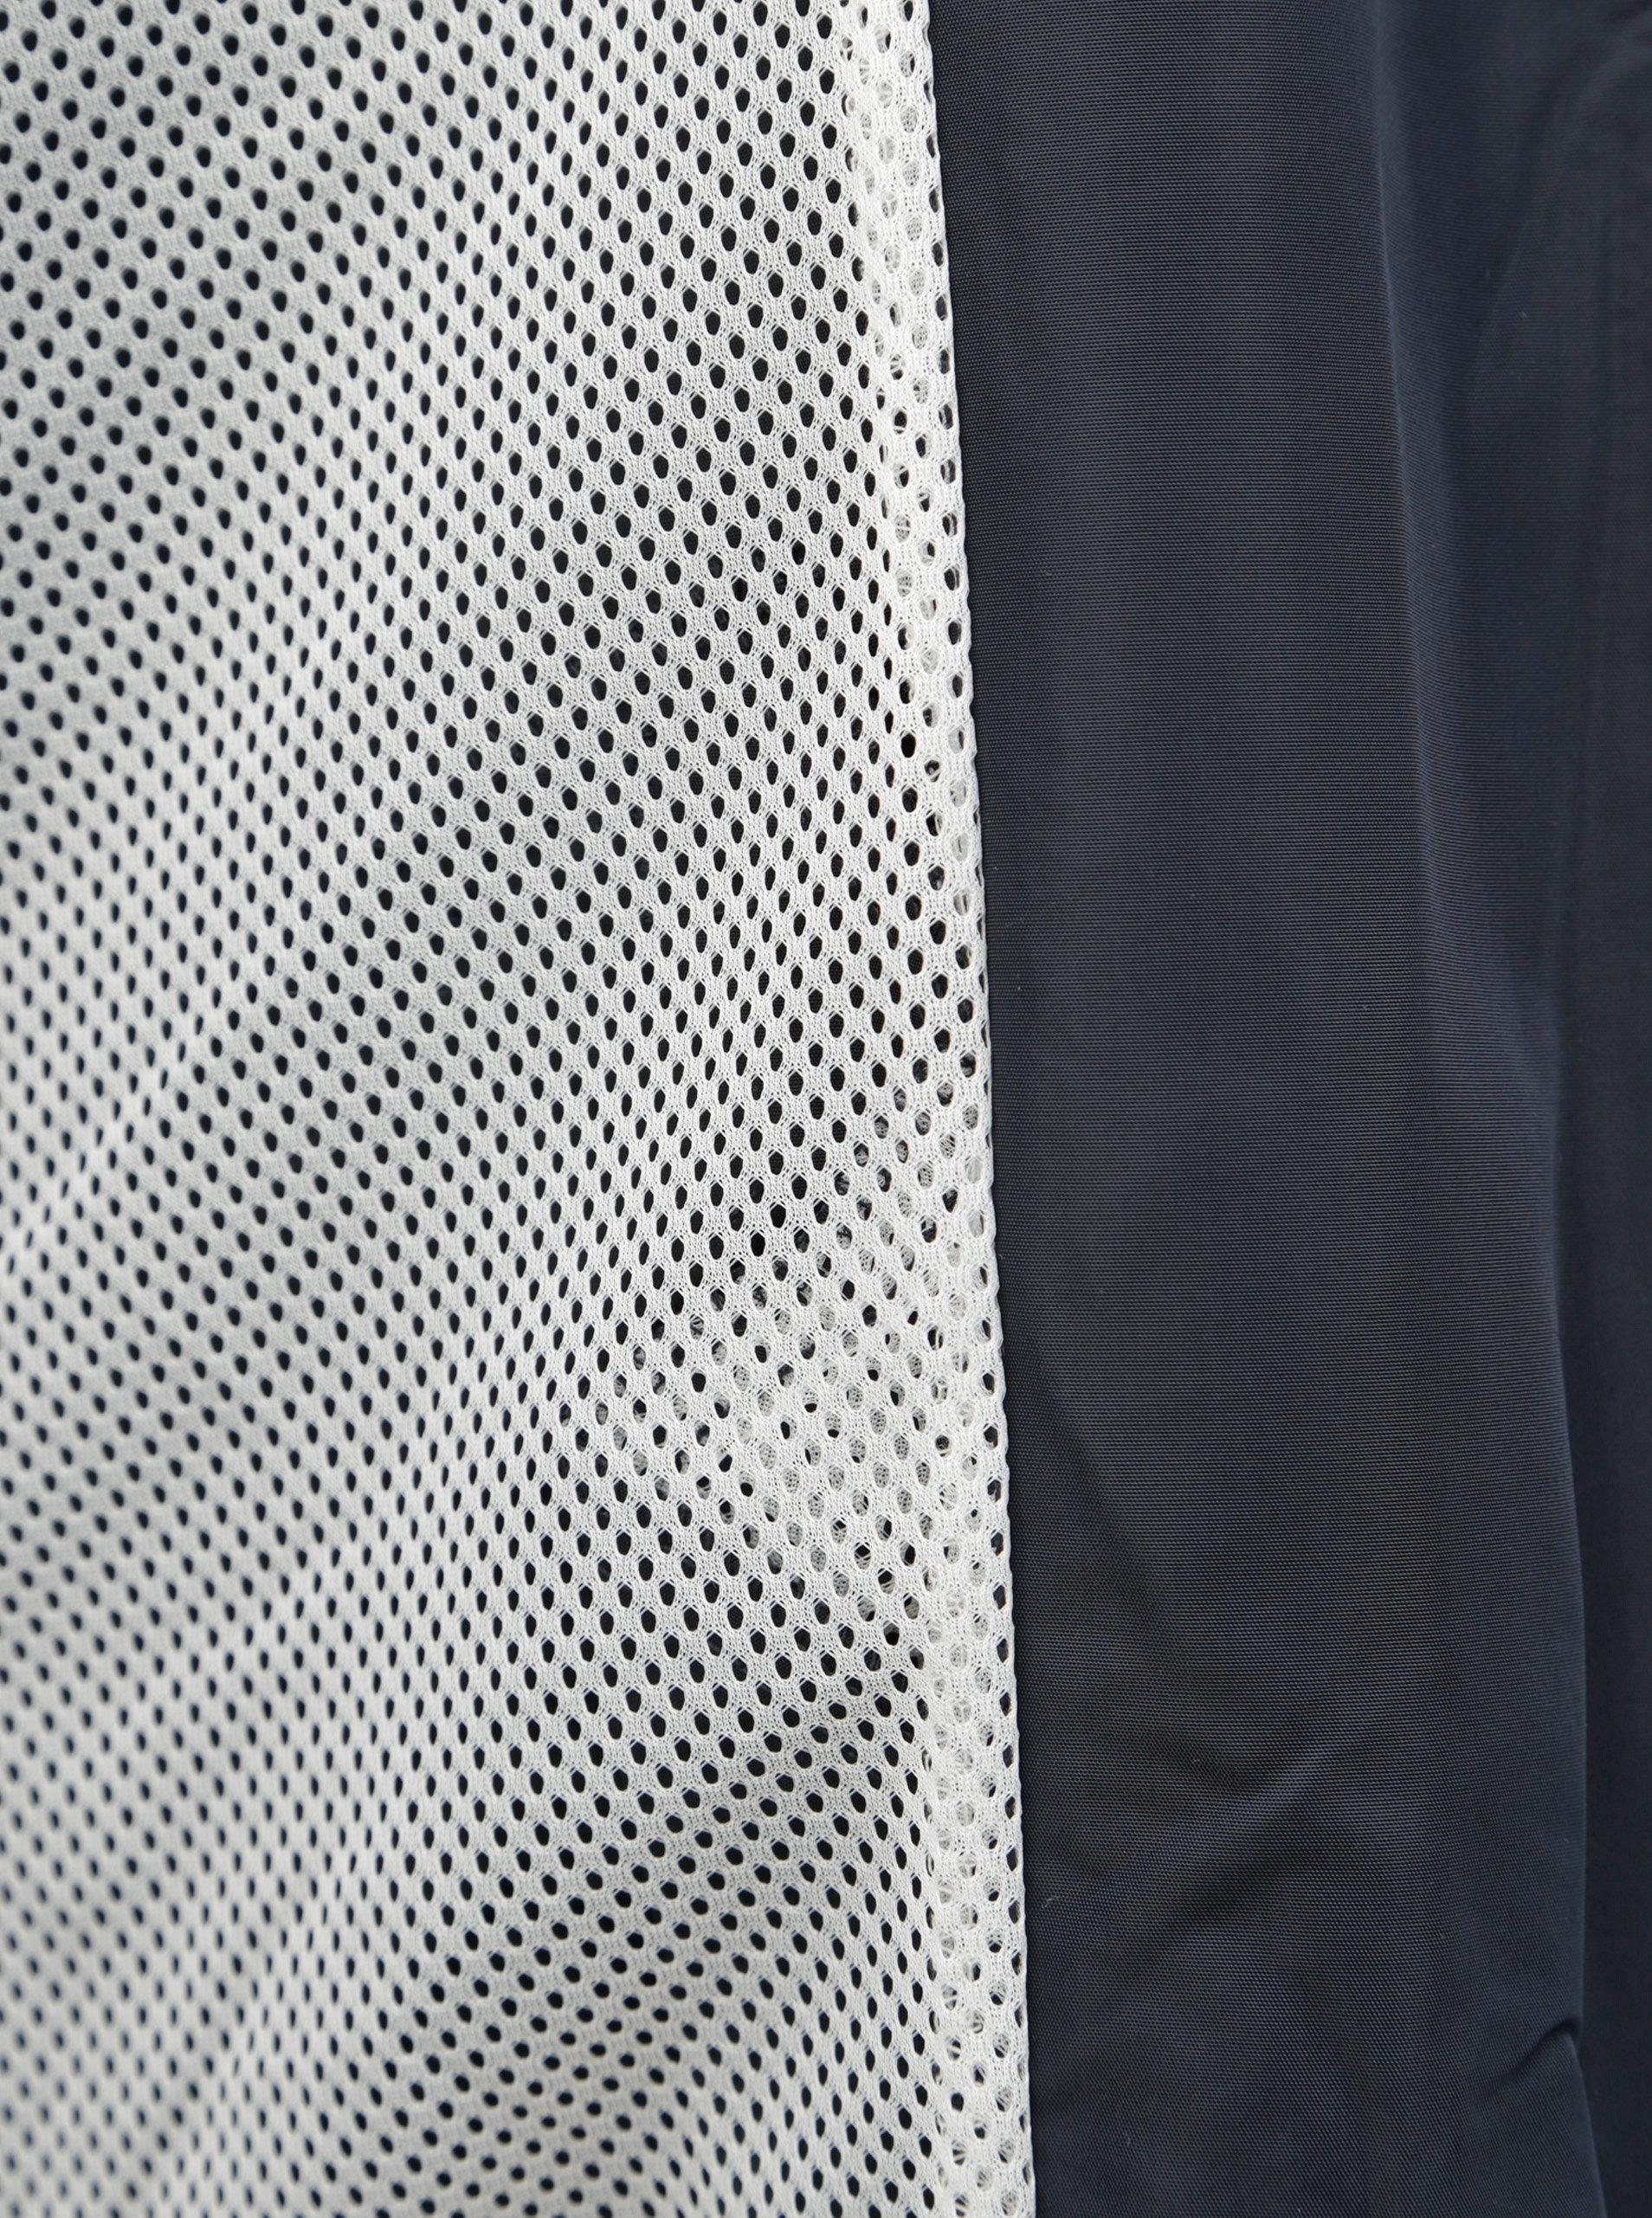 4cc2c43d9f Tmavomodrá dámske tenká nepremokavá bunda Tommy Hilfiger Saba ...